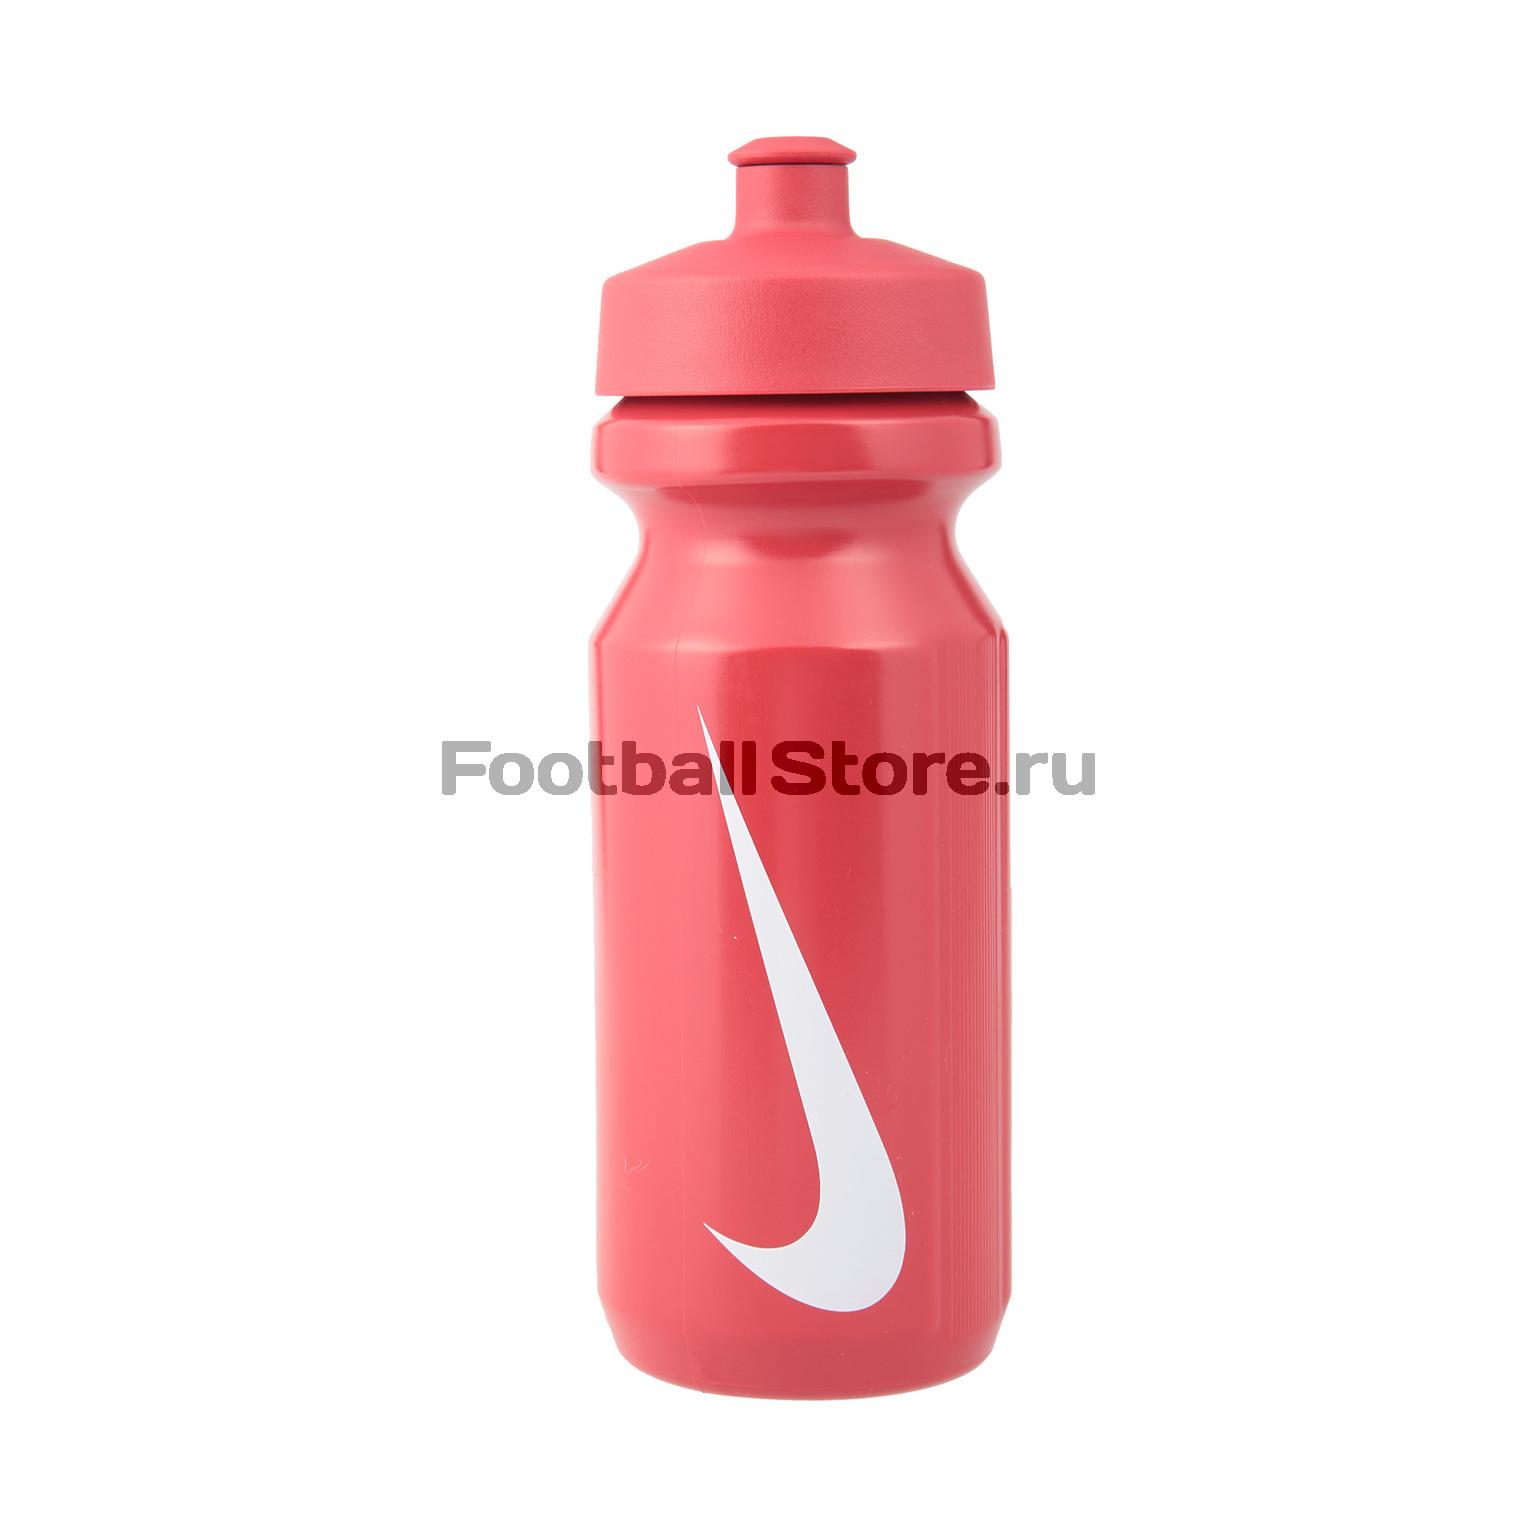 Бутылка для воды Nike Big Mouth Water 220 Z Sport N.OB.17.660.22 бутылка для воды nike 0 65 л big mouth water bottle nob17 968 прозр чер